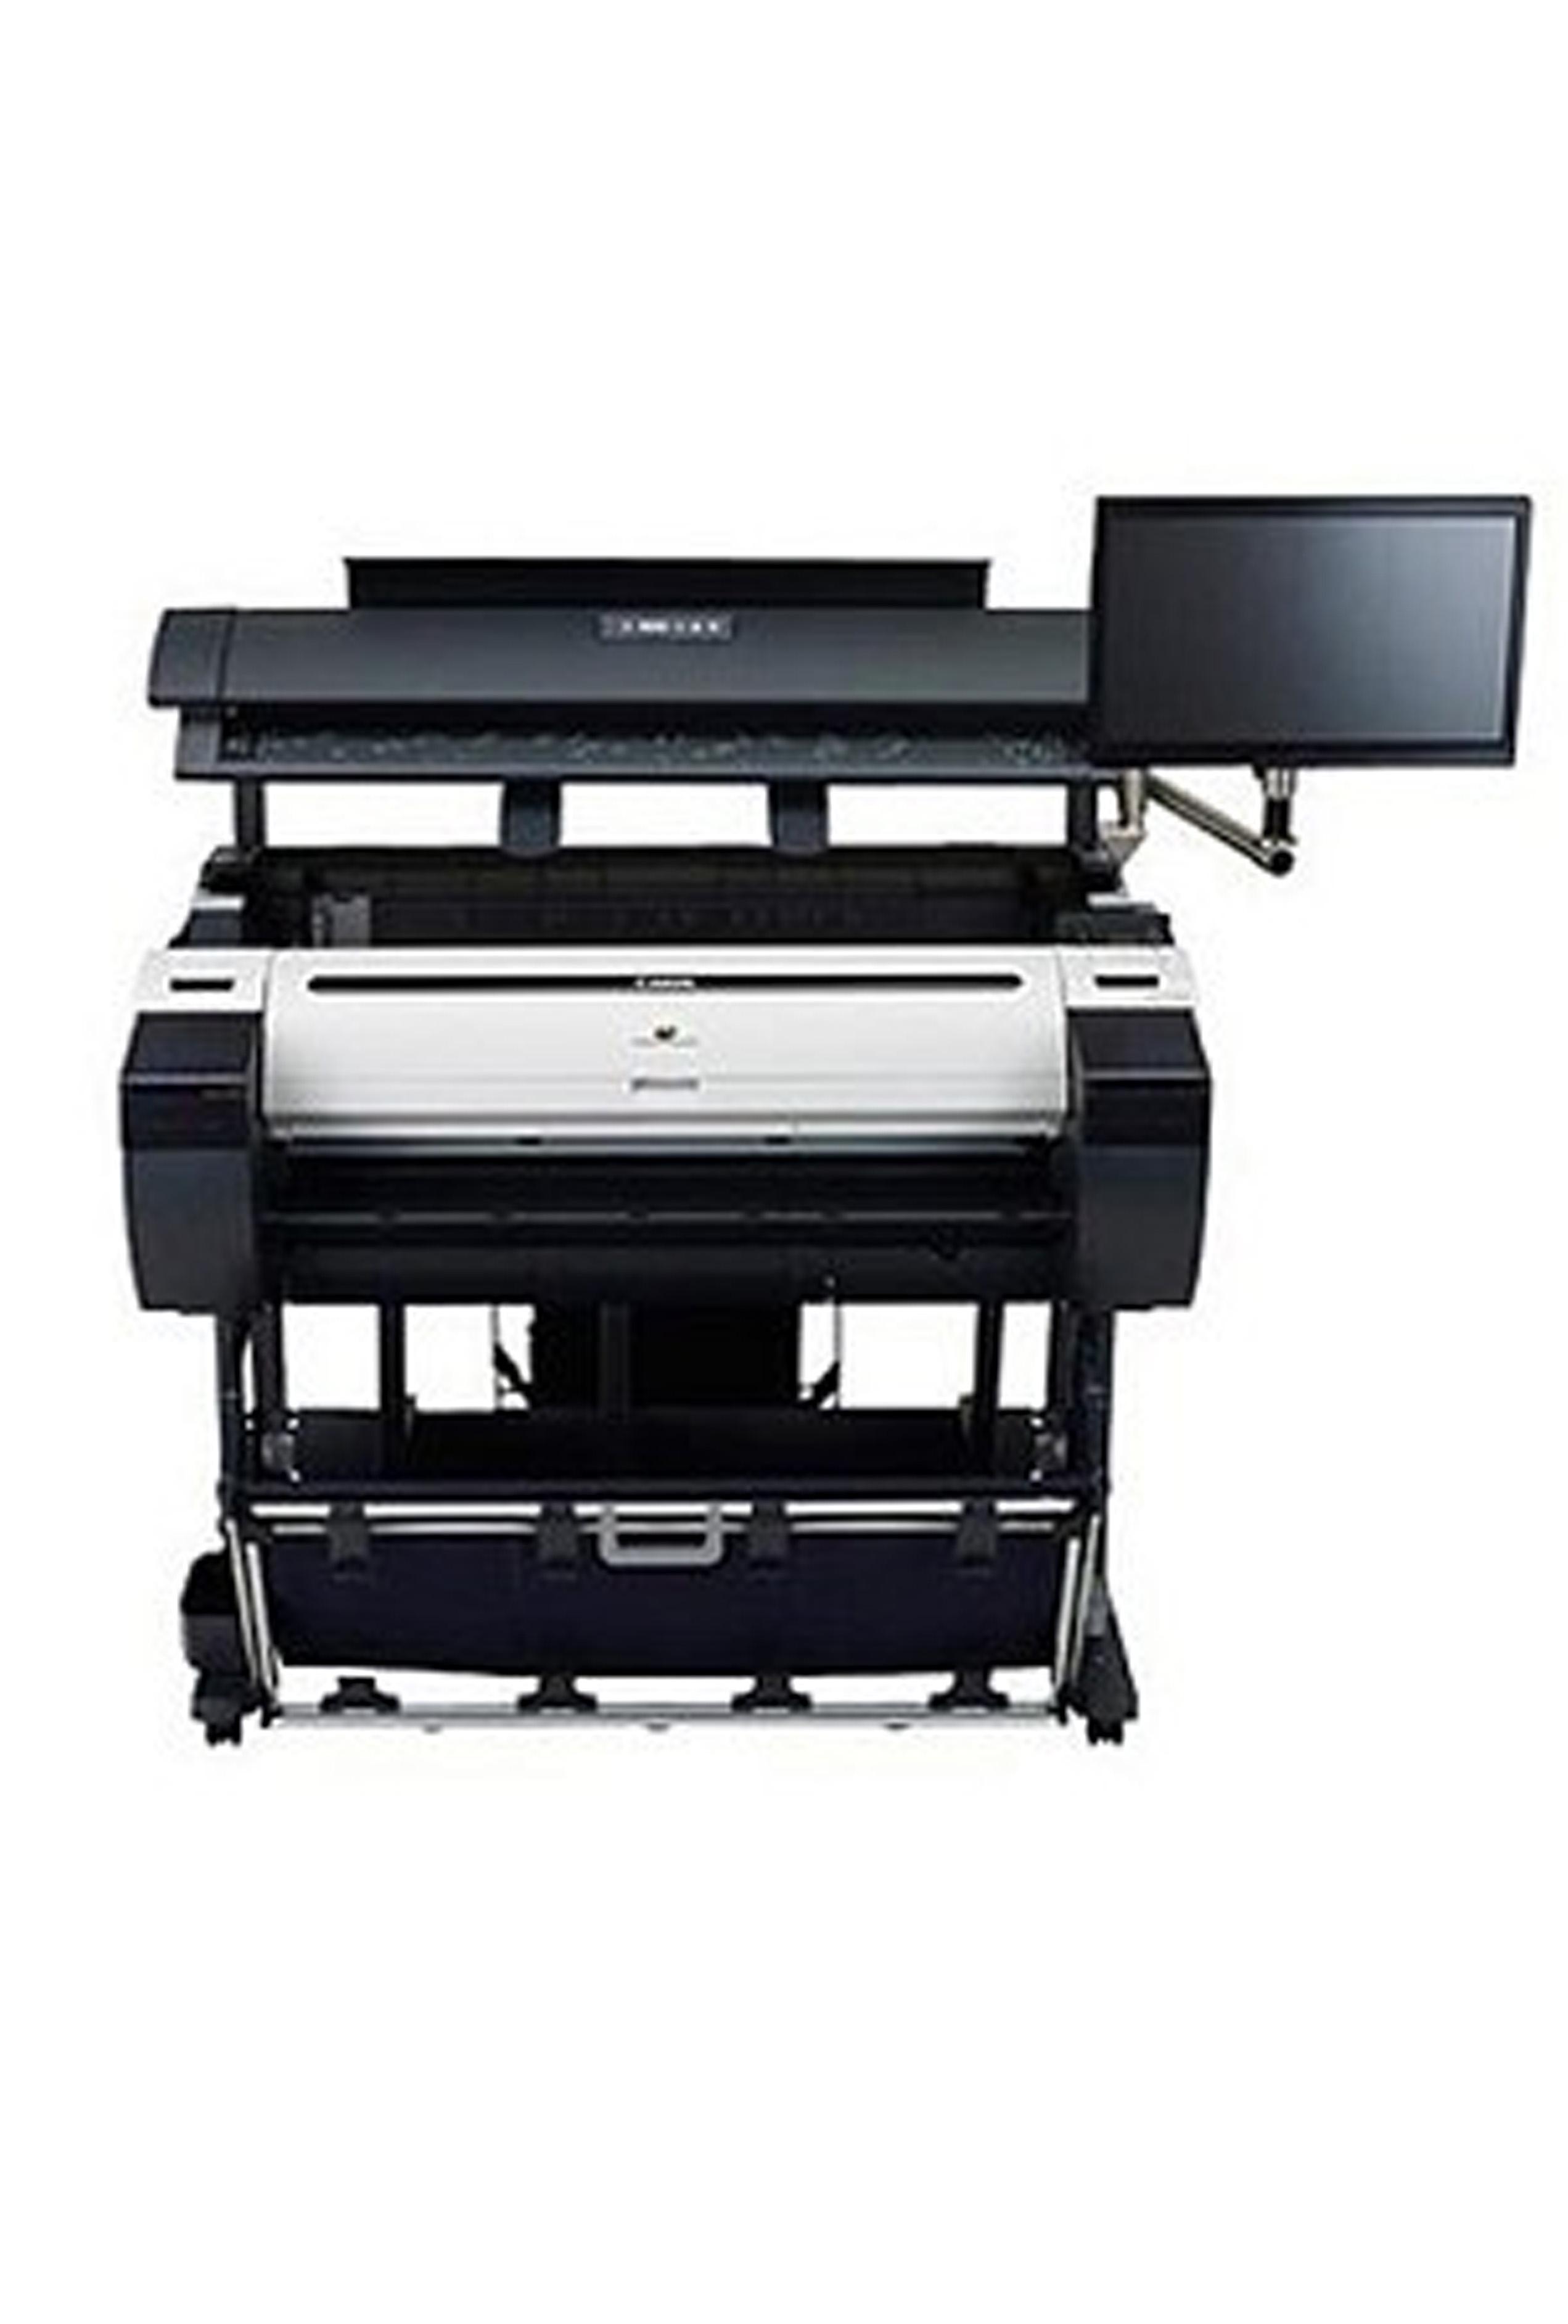 Canon imagePROGRAF IPF785 MFP M40 Large Format Printer